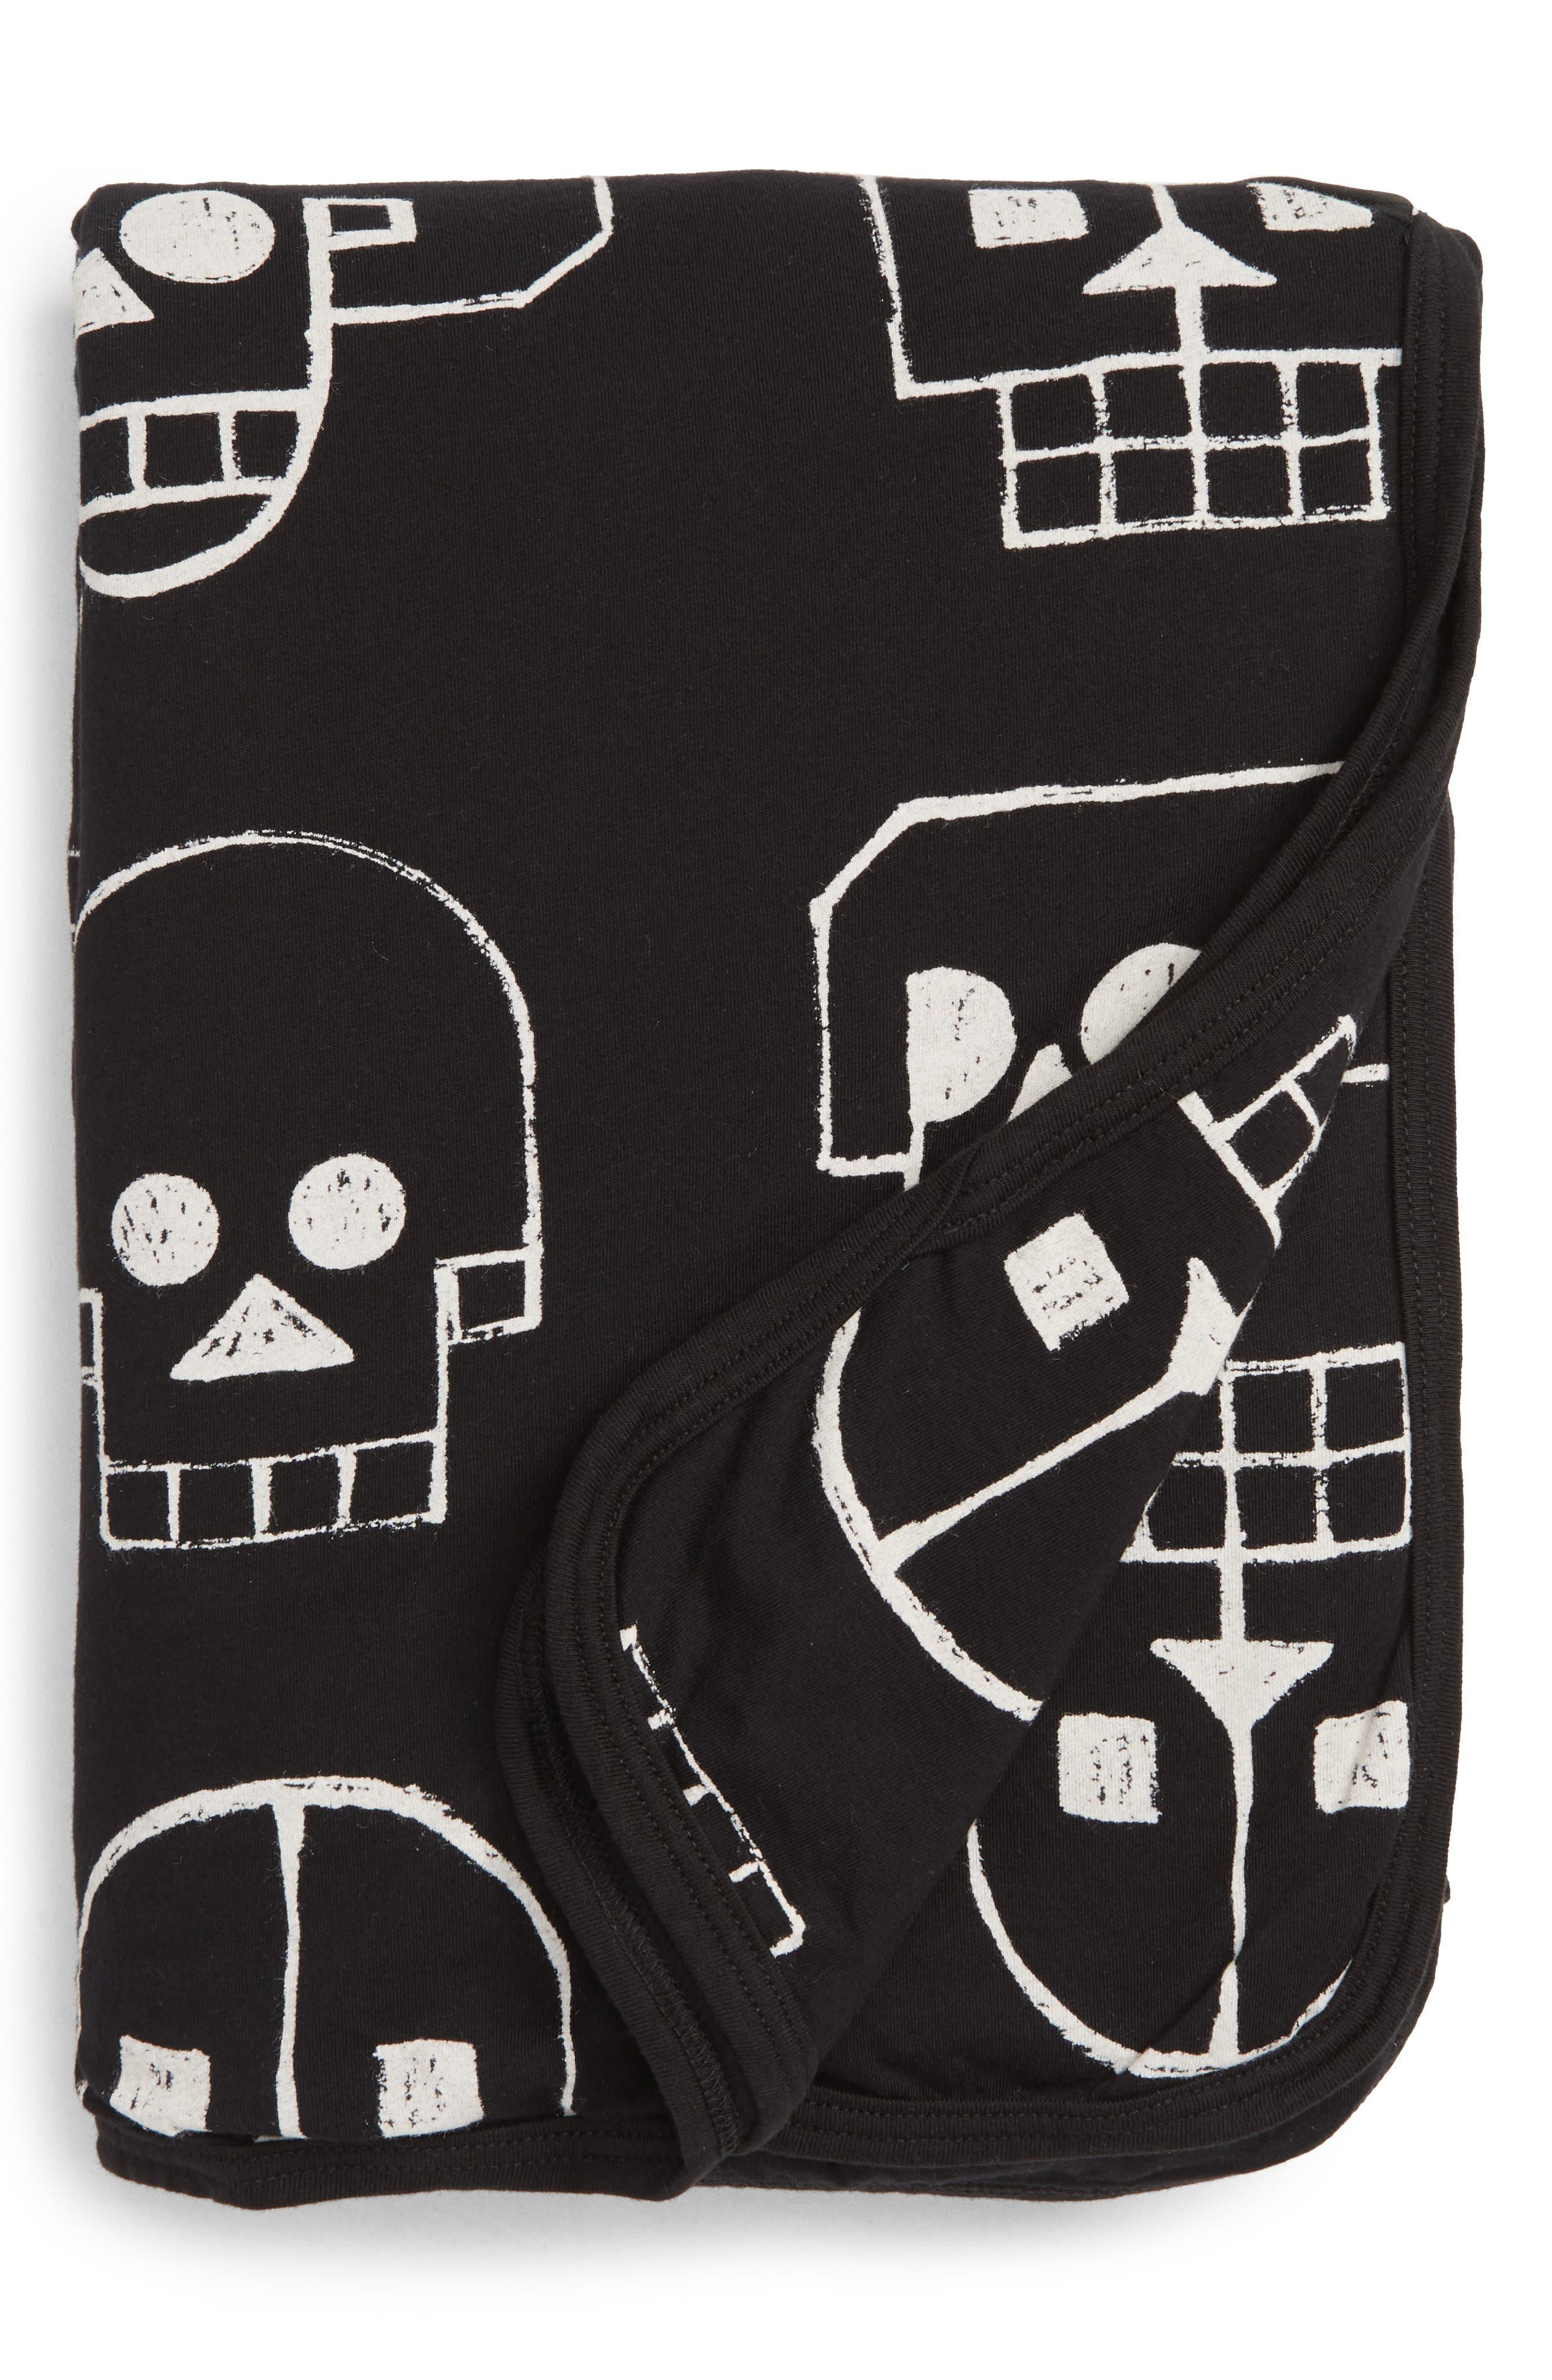 Skull Robot Print Blanket,                             Main thumbnail 1, color,                             BLACK